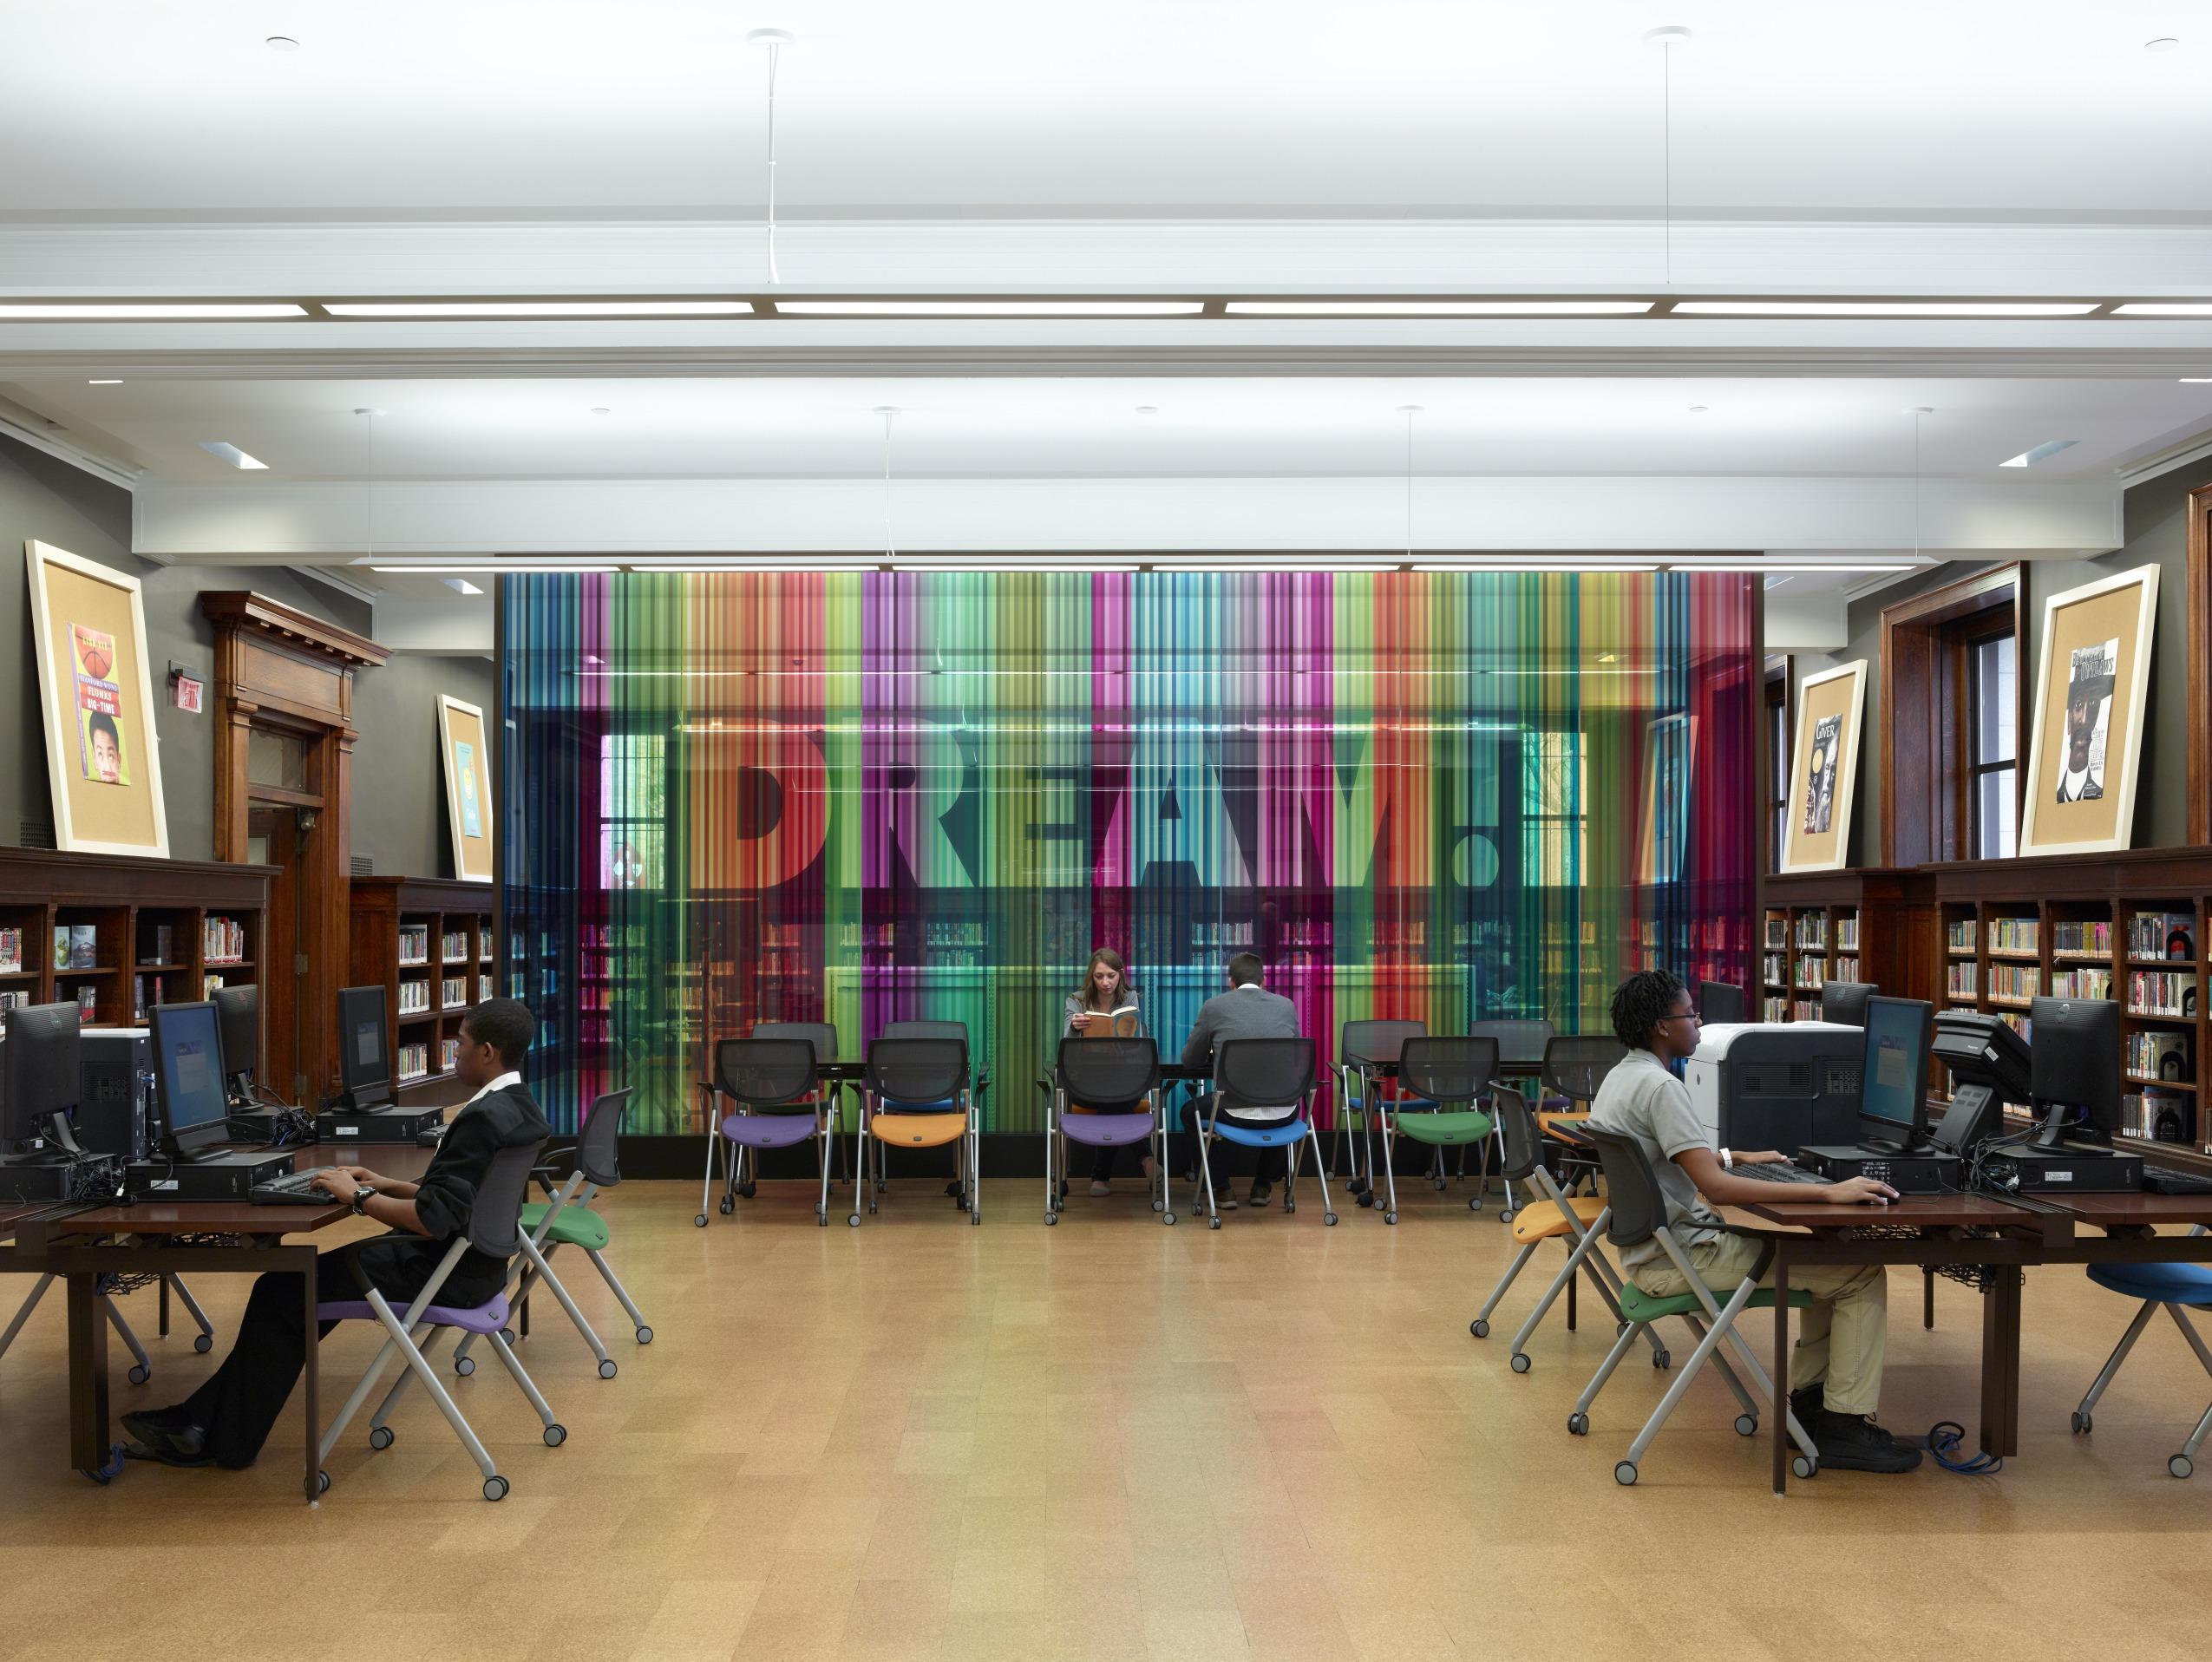 St louis public library transformation architect - Interior design schools in st louis mo ...